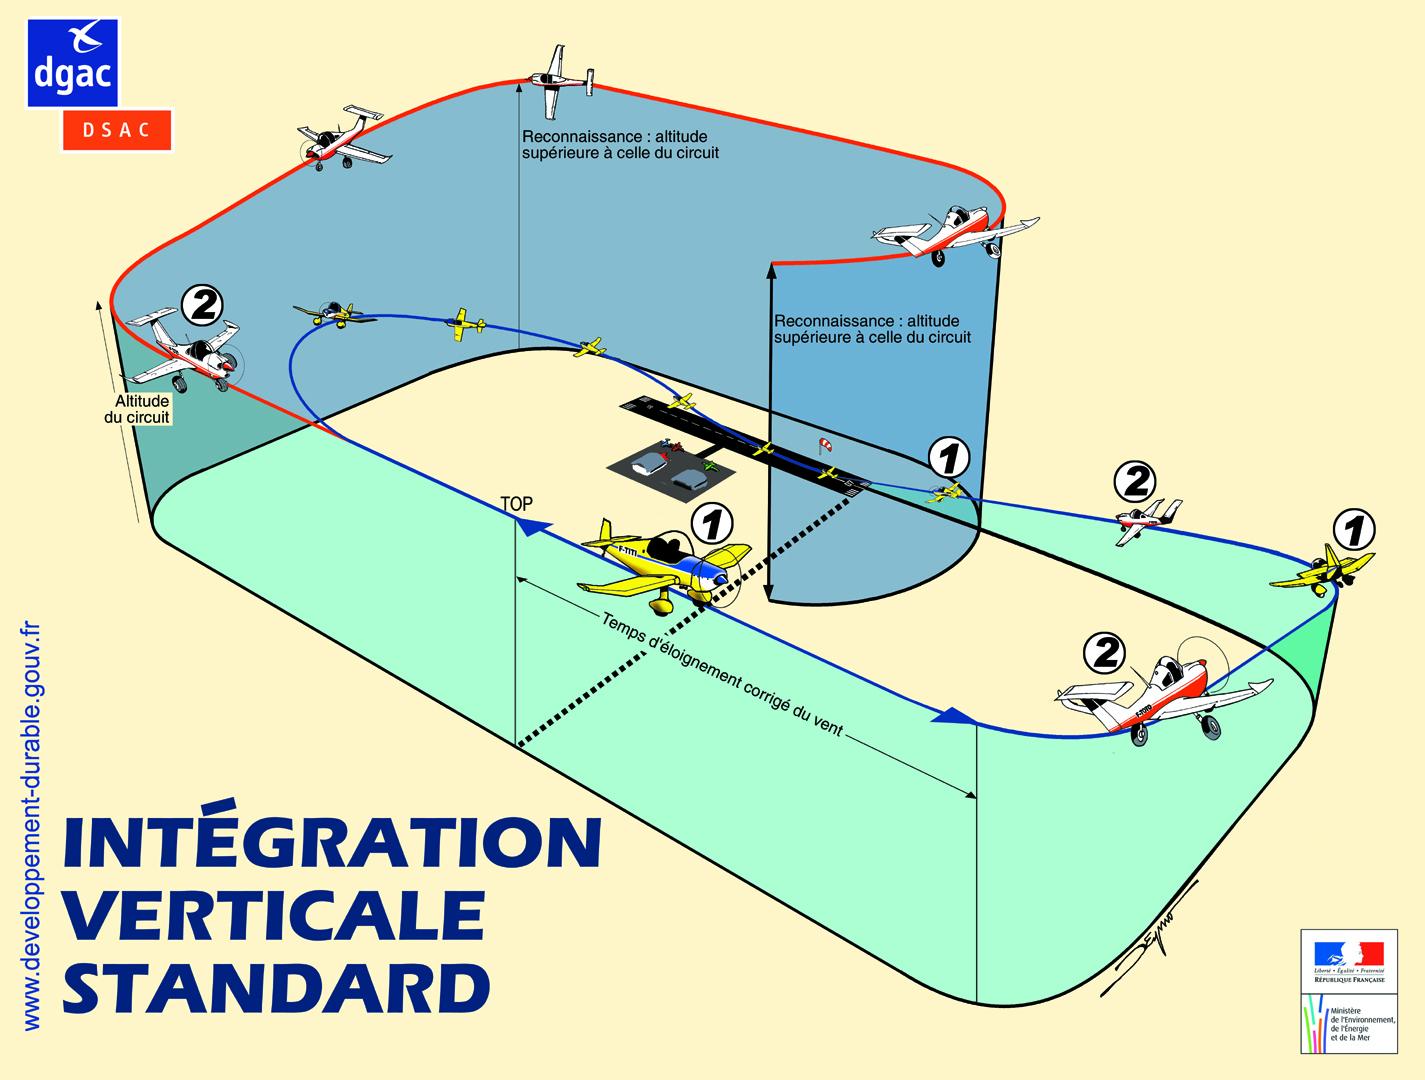 Intégration verticale standard